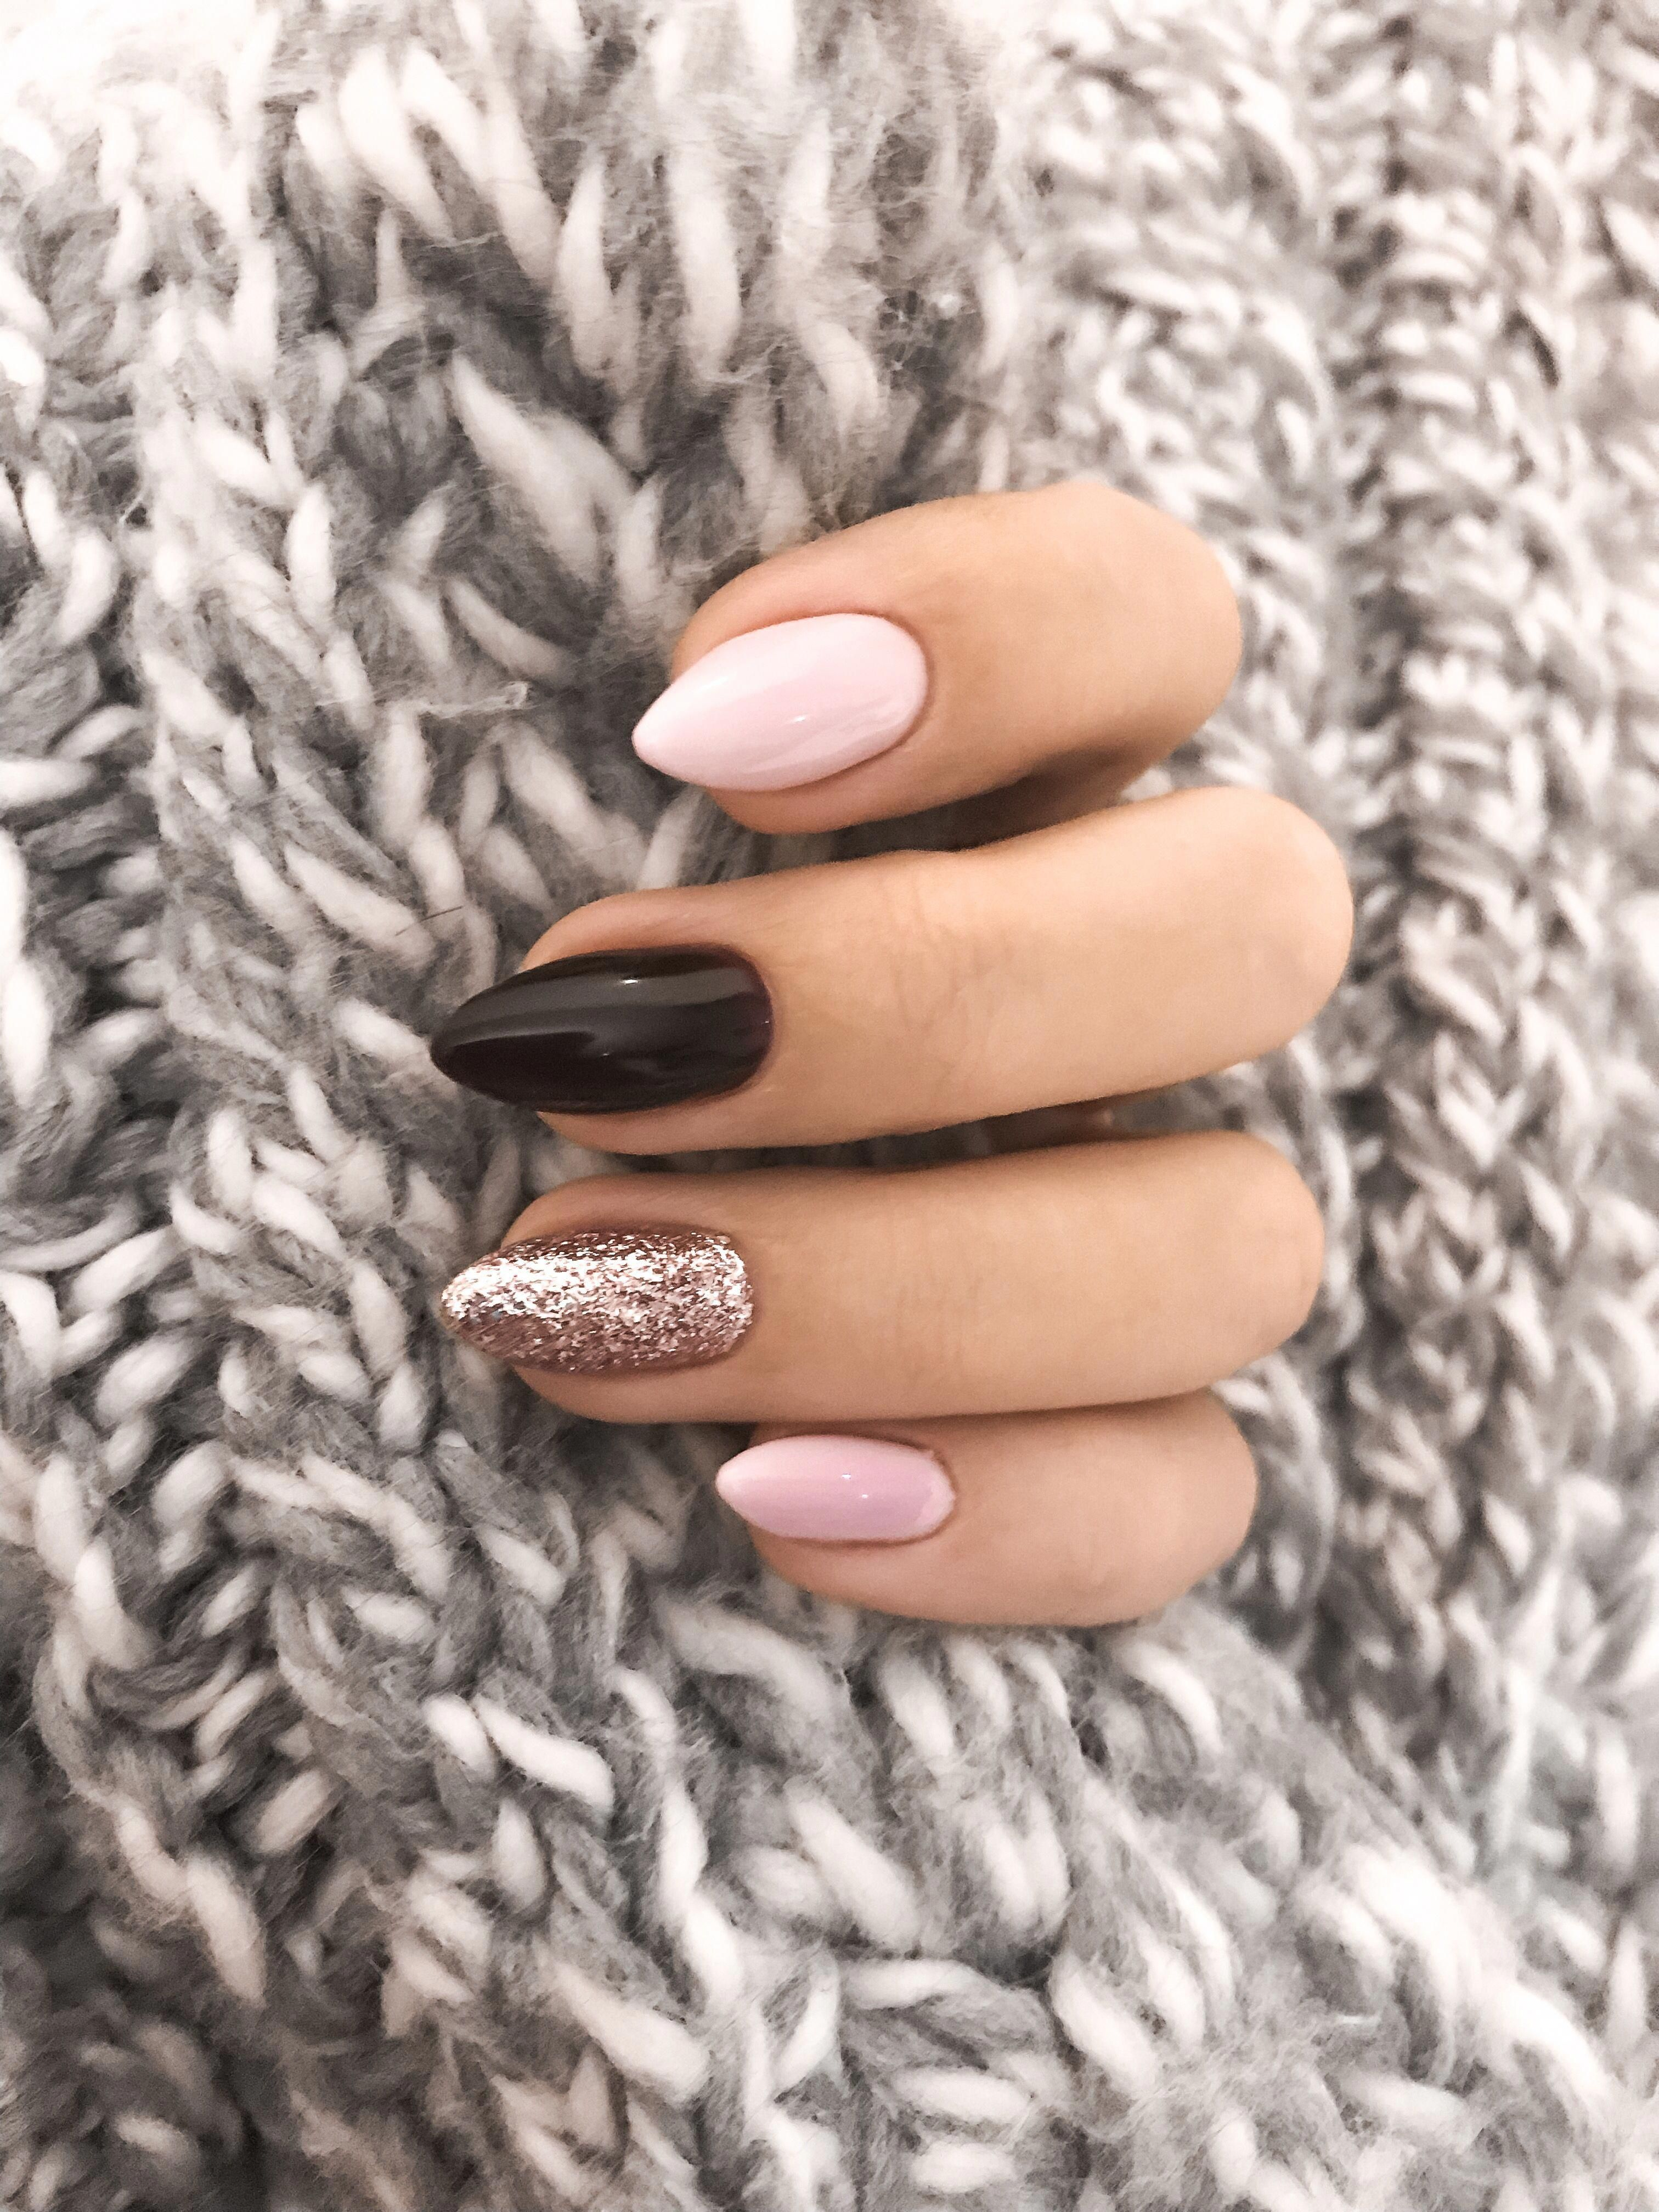 Nails Fallnails Autumnnails Beauty Unas Unaslargas Manicure Manicura Nogti Manikyur Beautifulacrylicnails Nehet Zlate Nehty Vzory Pro Zdobeni Nehtu